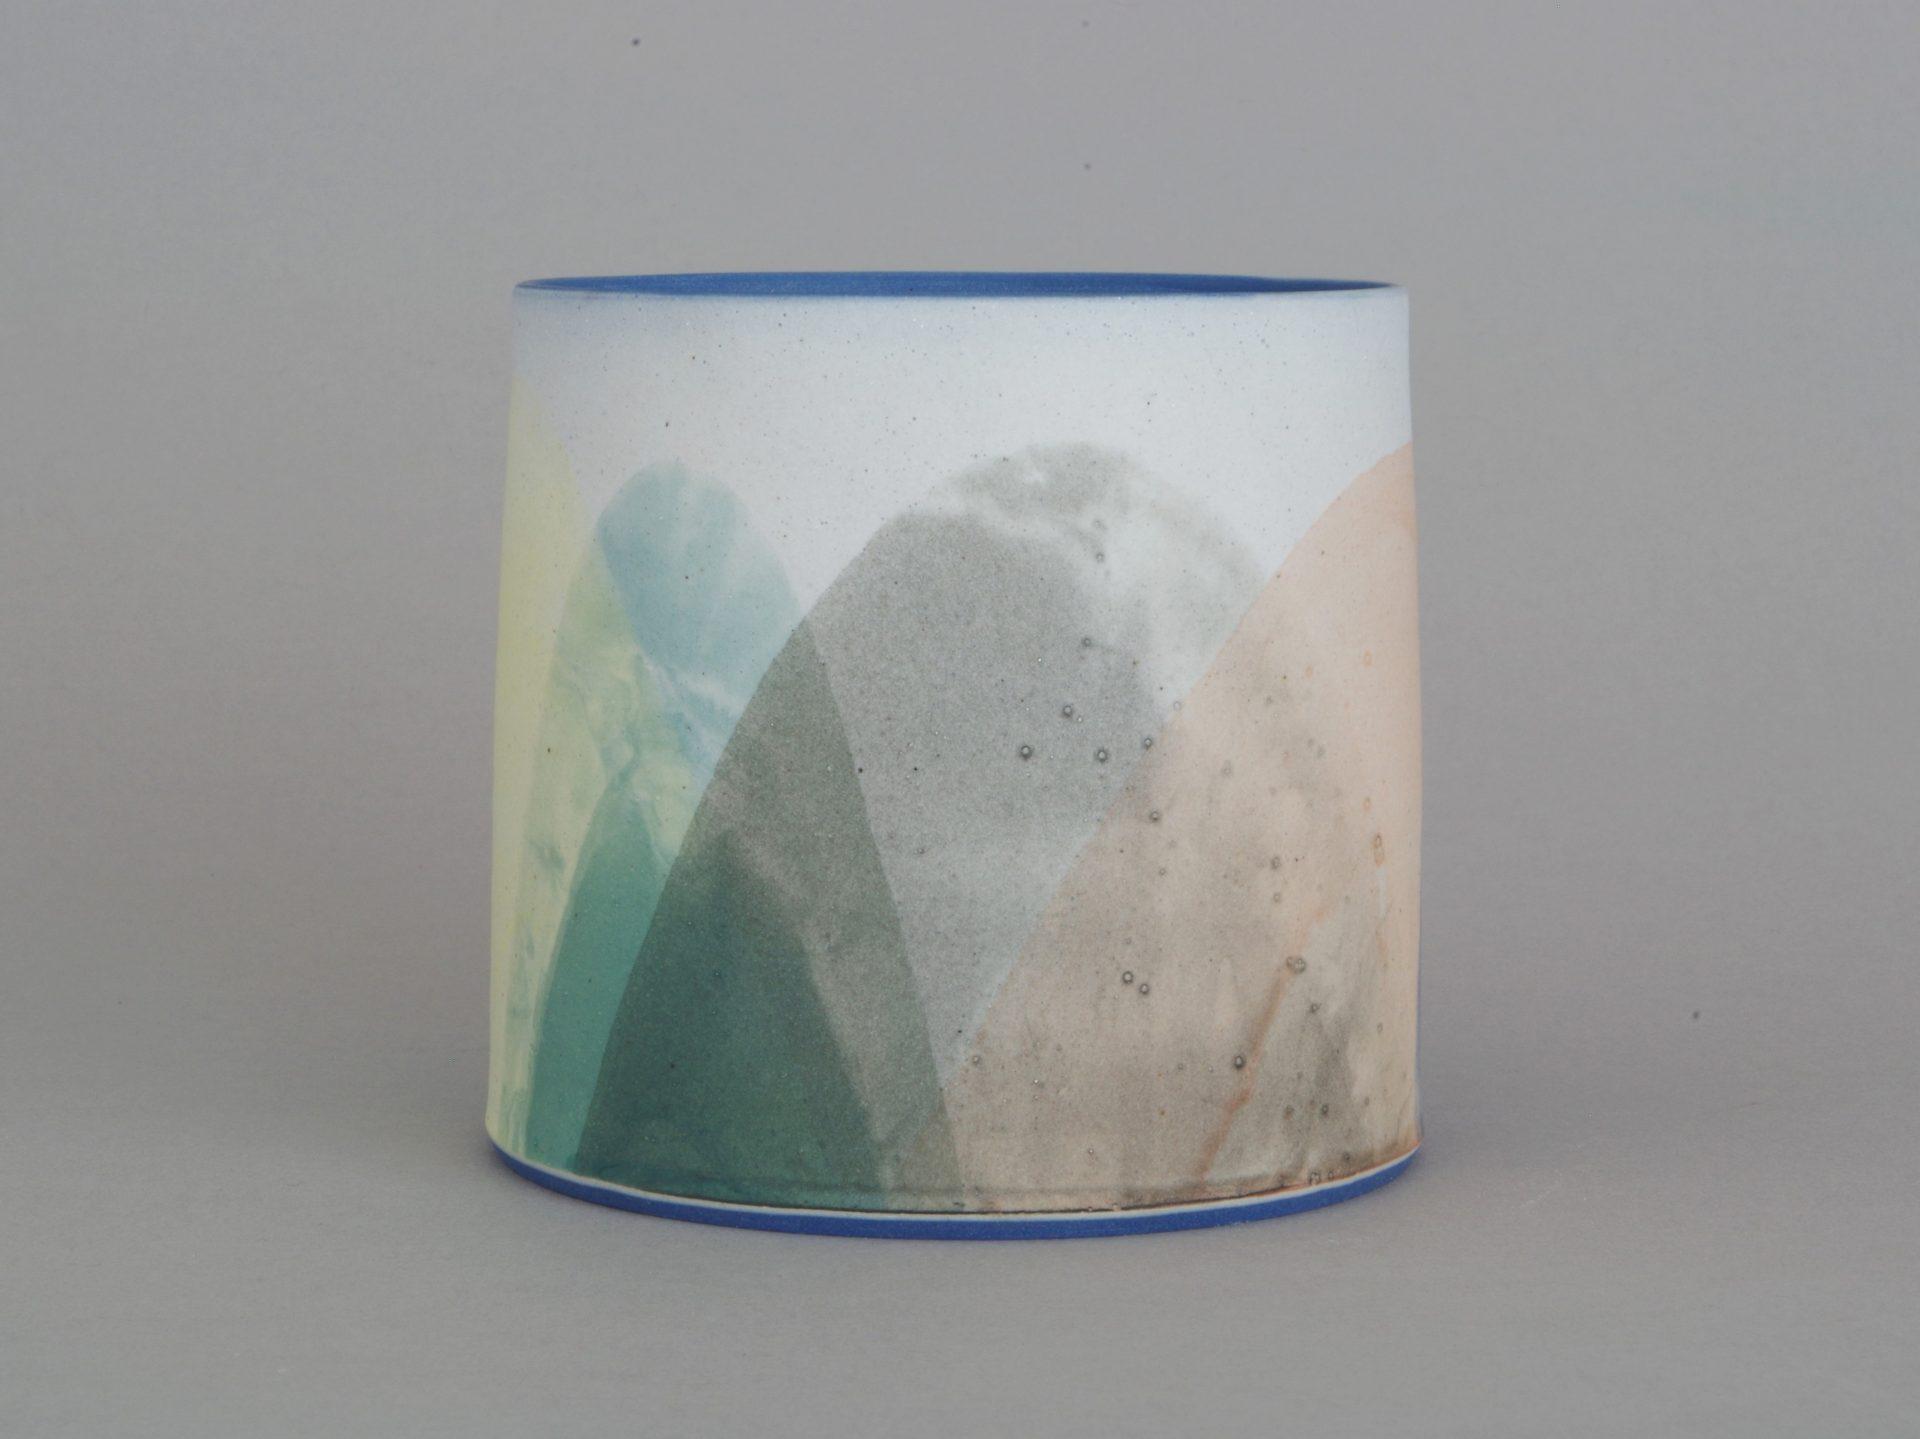 73-blue-morris-h9cm-jan-13-£250